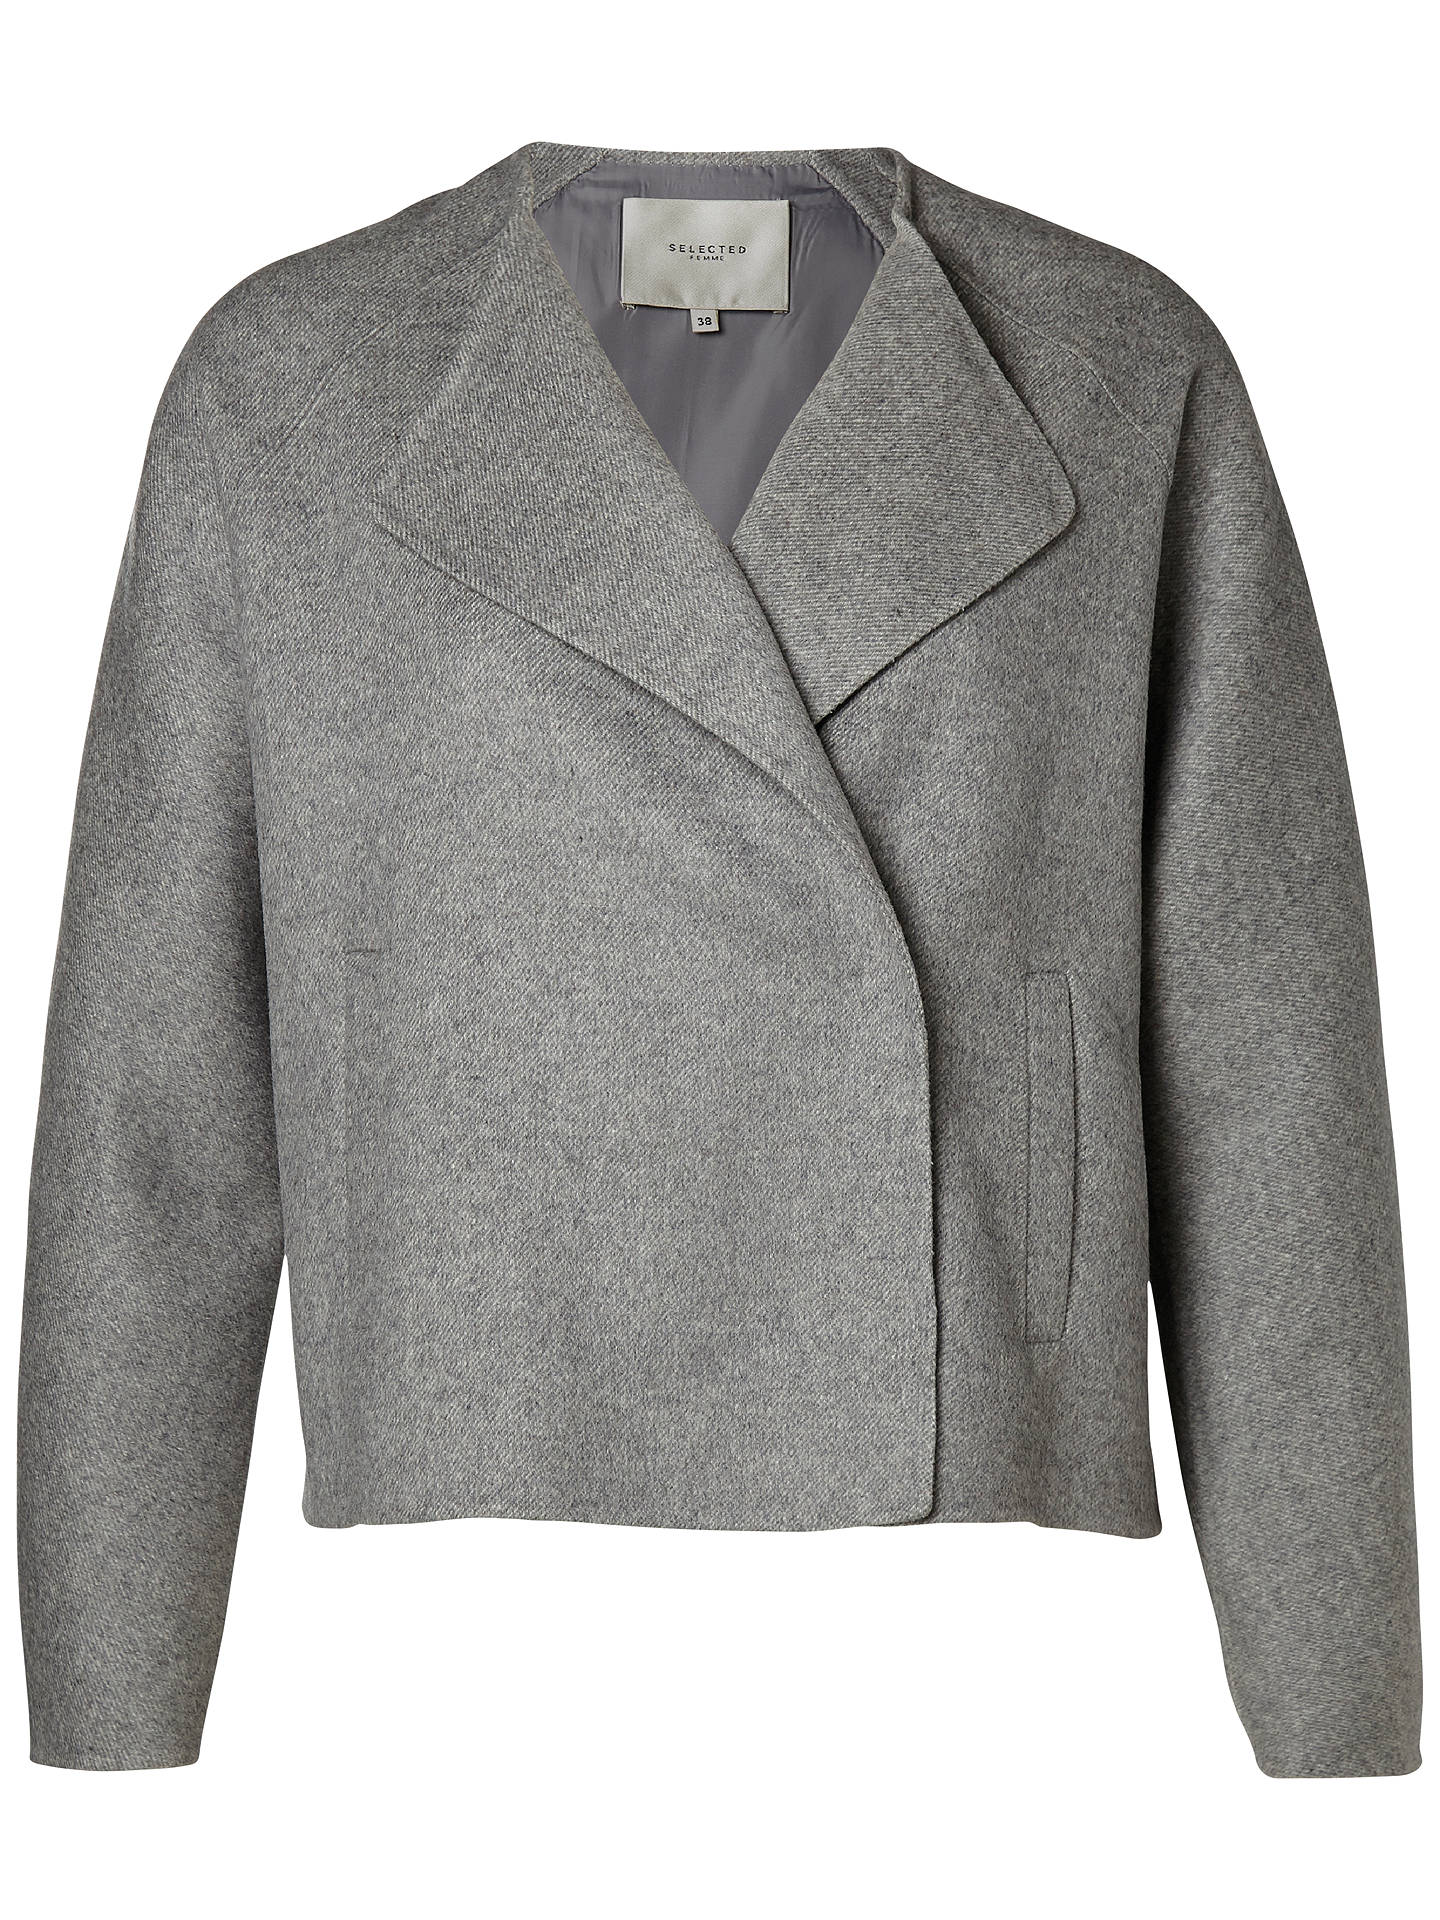 f9c1183422473 Buy Selected Femme Adana Jacket, Grey, 8 Online at johnlewis.com ...